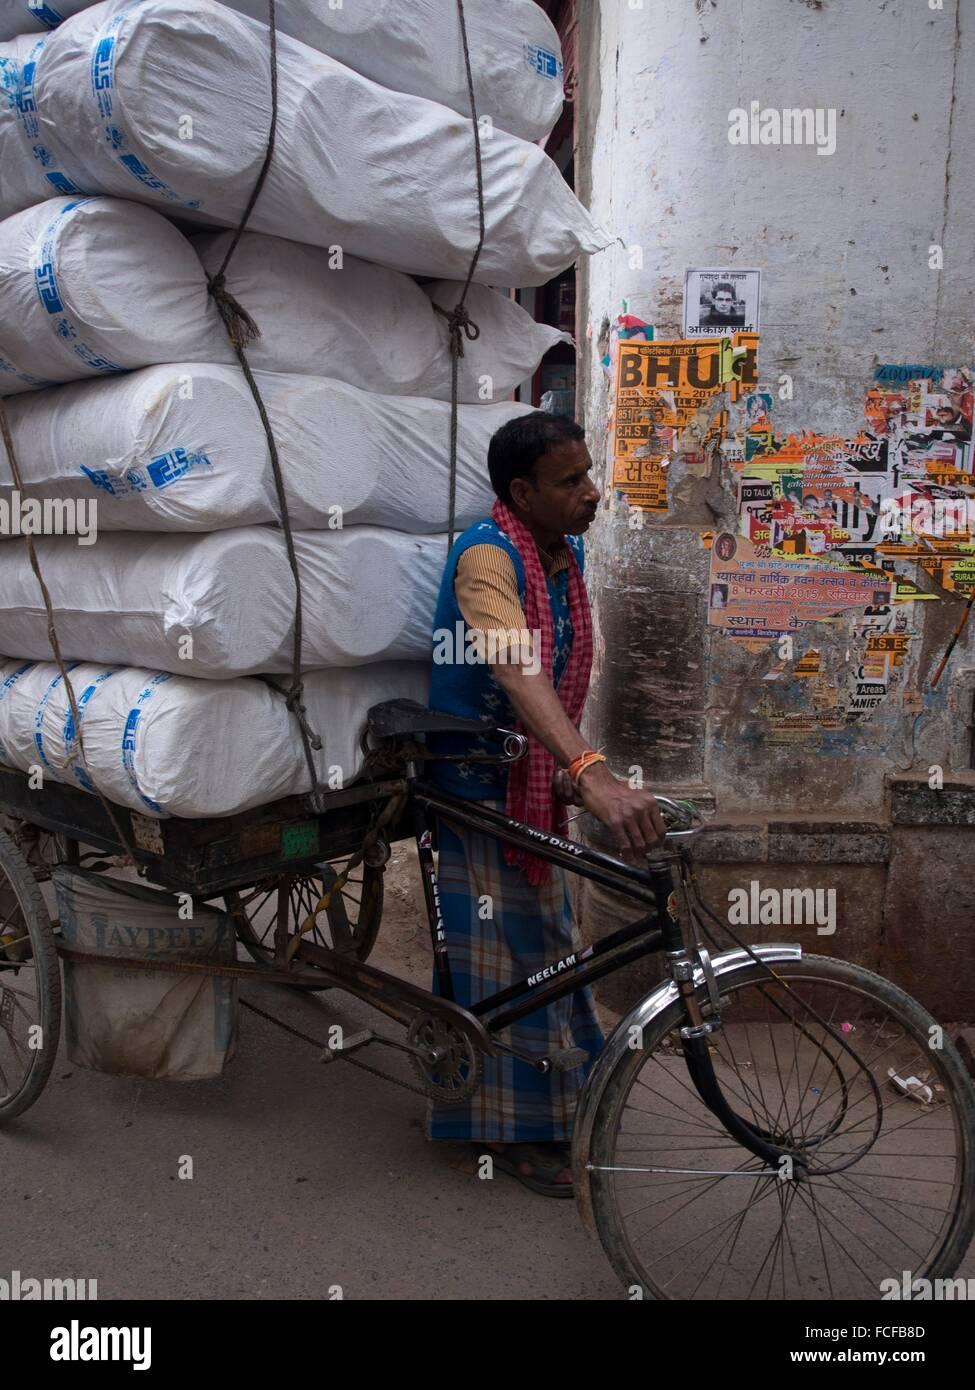 Man pulling overloaded cycle cart, Varanasi, Uttar Pradesh, India. - Stock Image